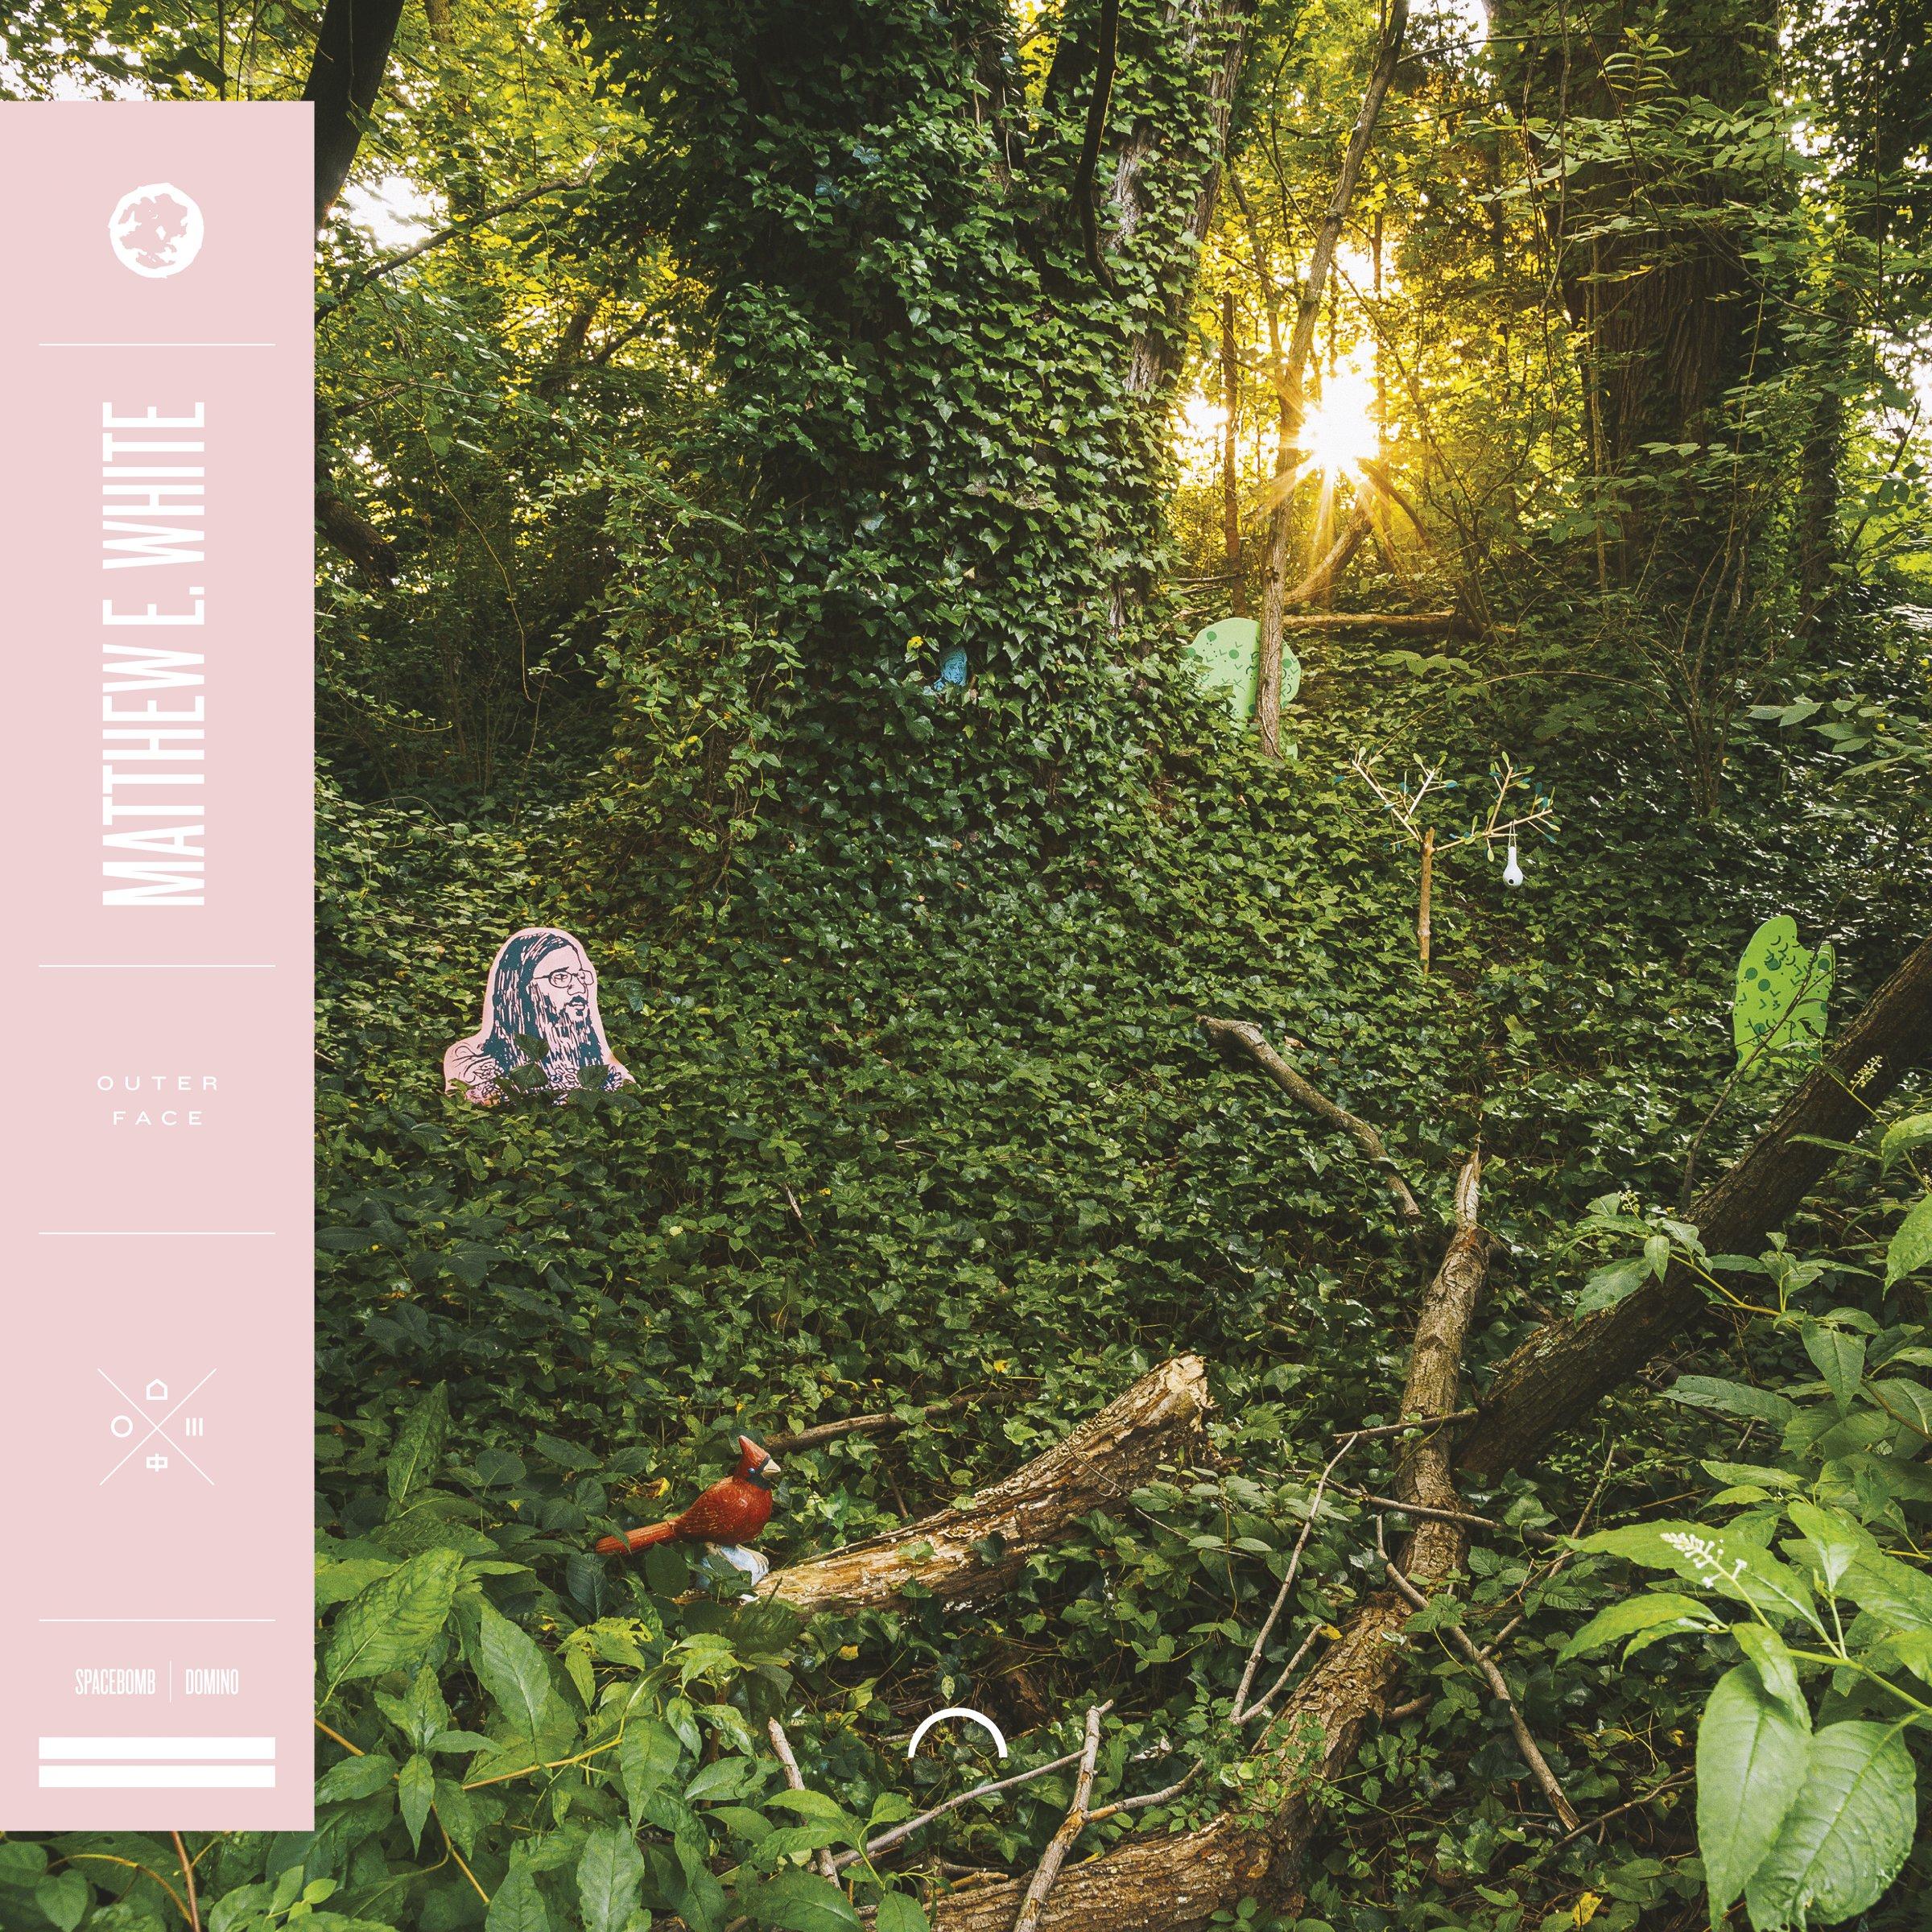 Vinilo : Matthew E. White - Outer Face (Downloadable Bonus Tracks)